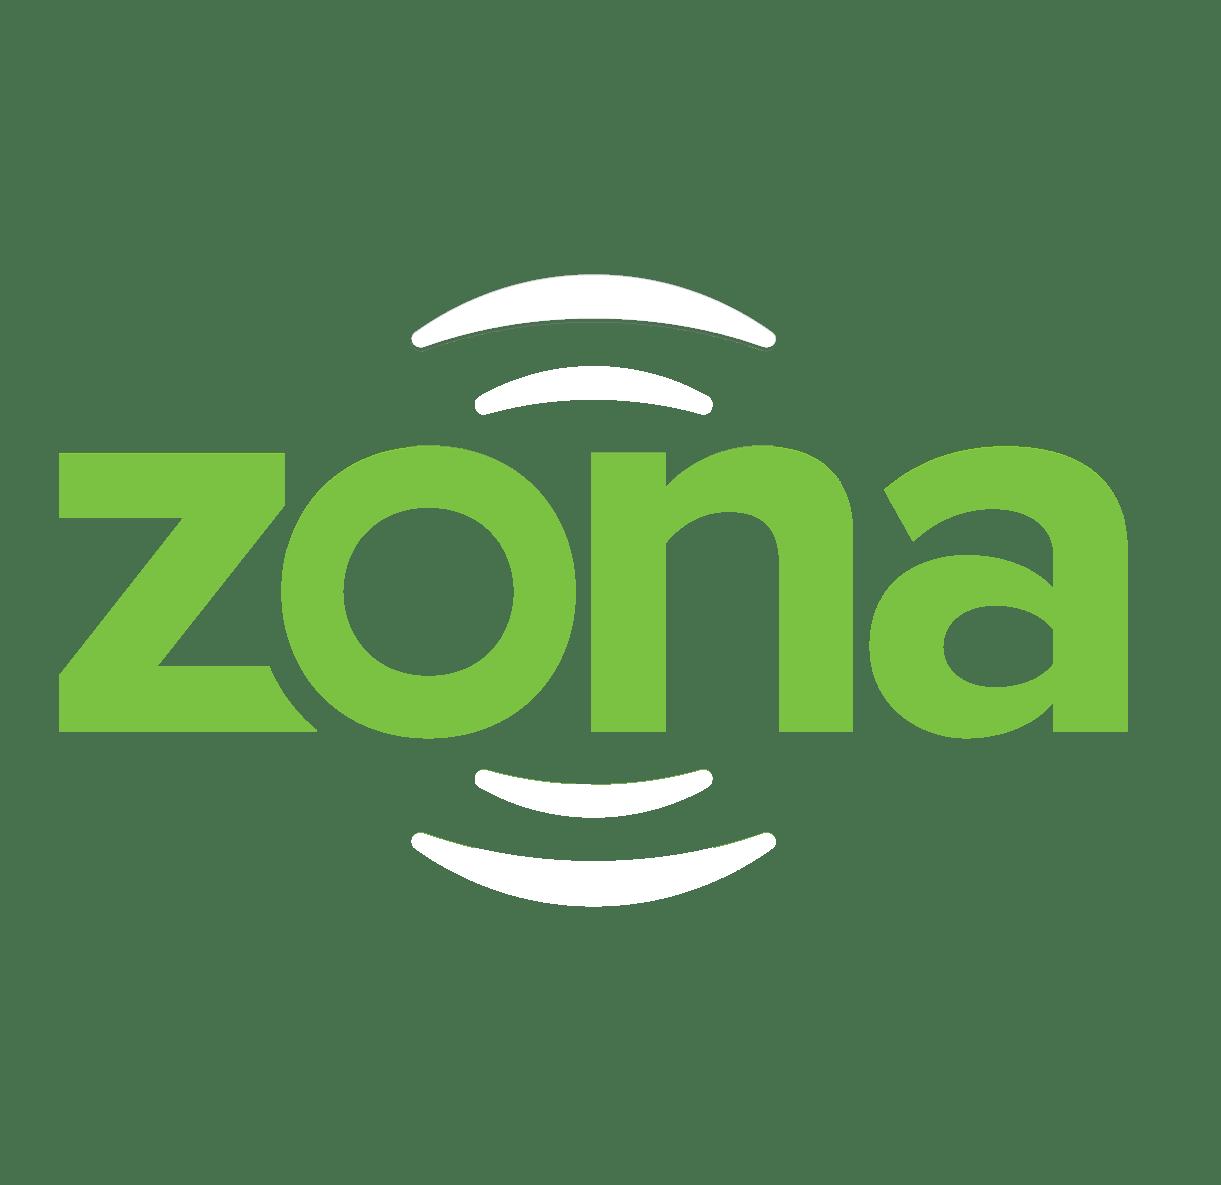 Zona - Telekomunikacije